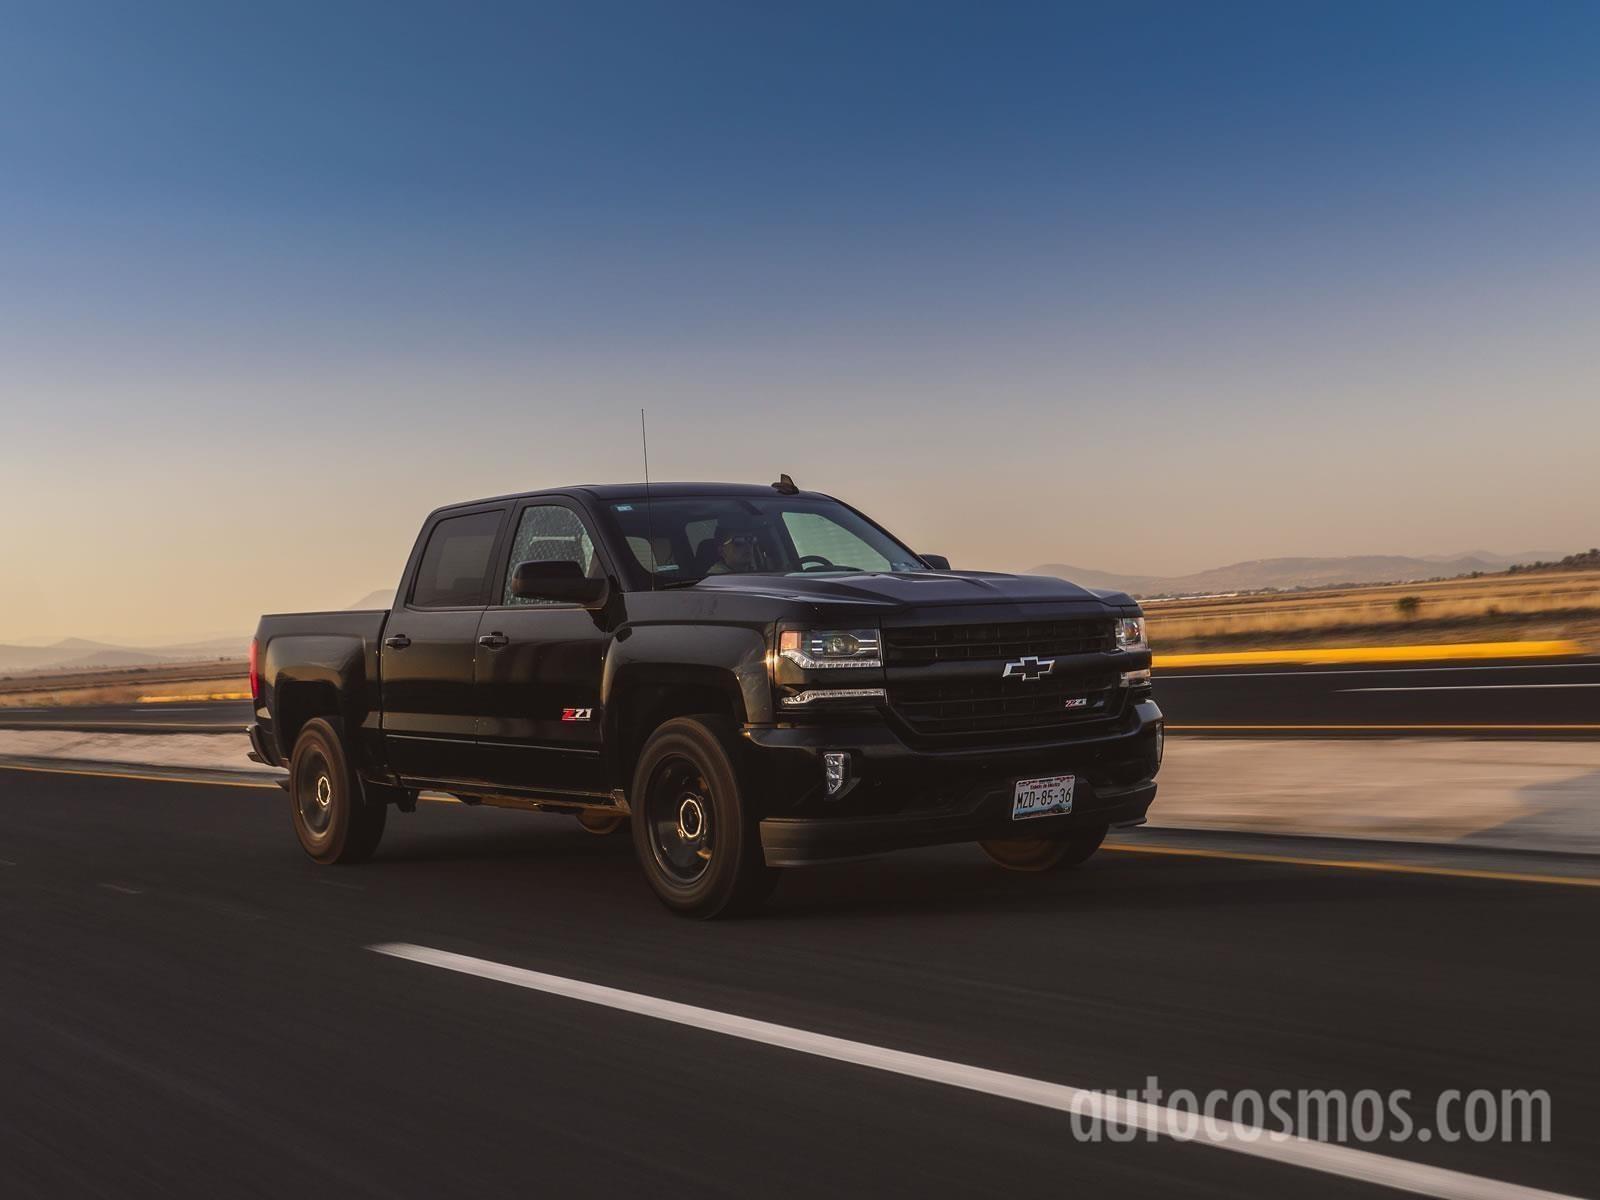 Chevrolet Cheyenne Midnight Edition 2017 a prueba ...